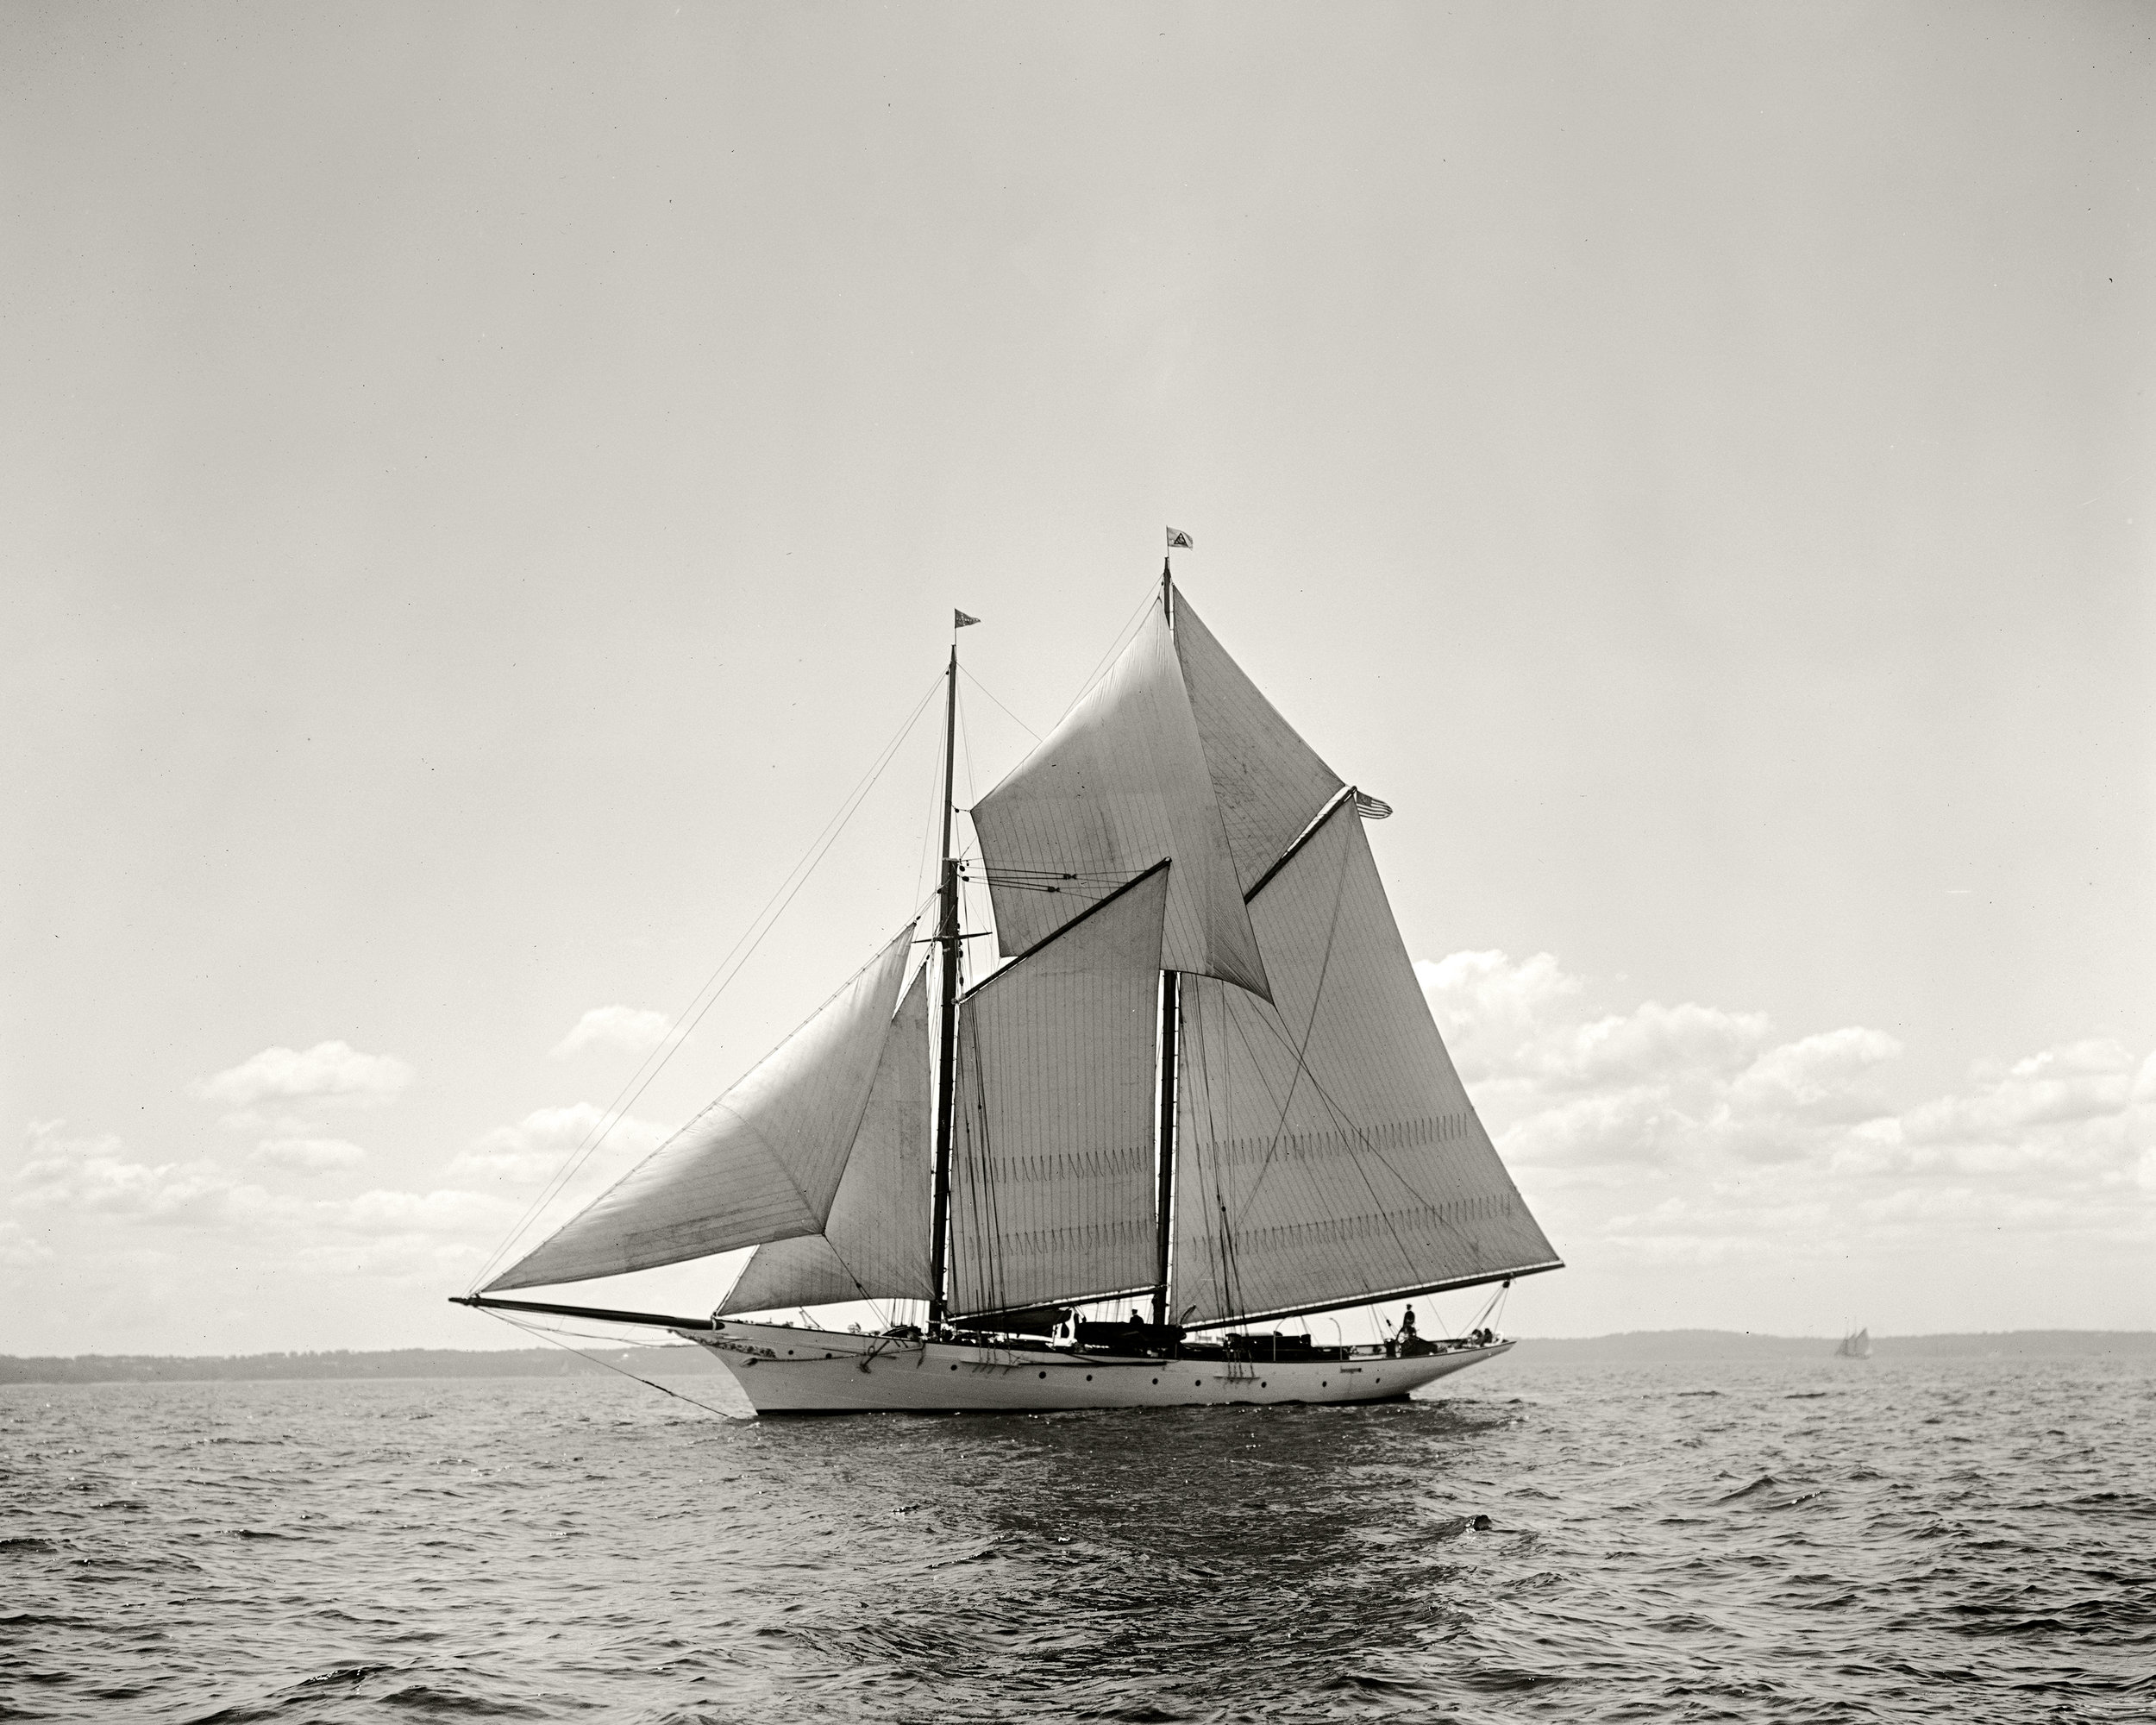 sailboat1adjustedfinaltint2contrast.jpg